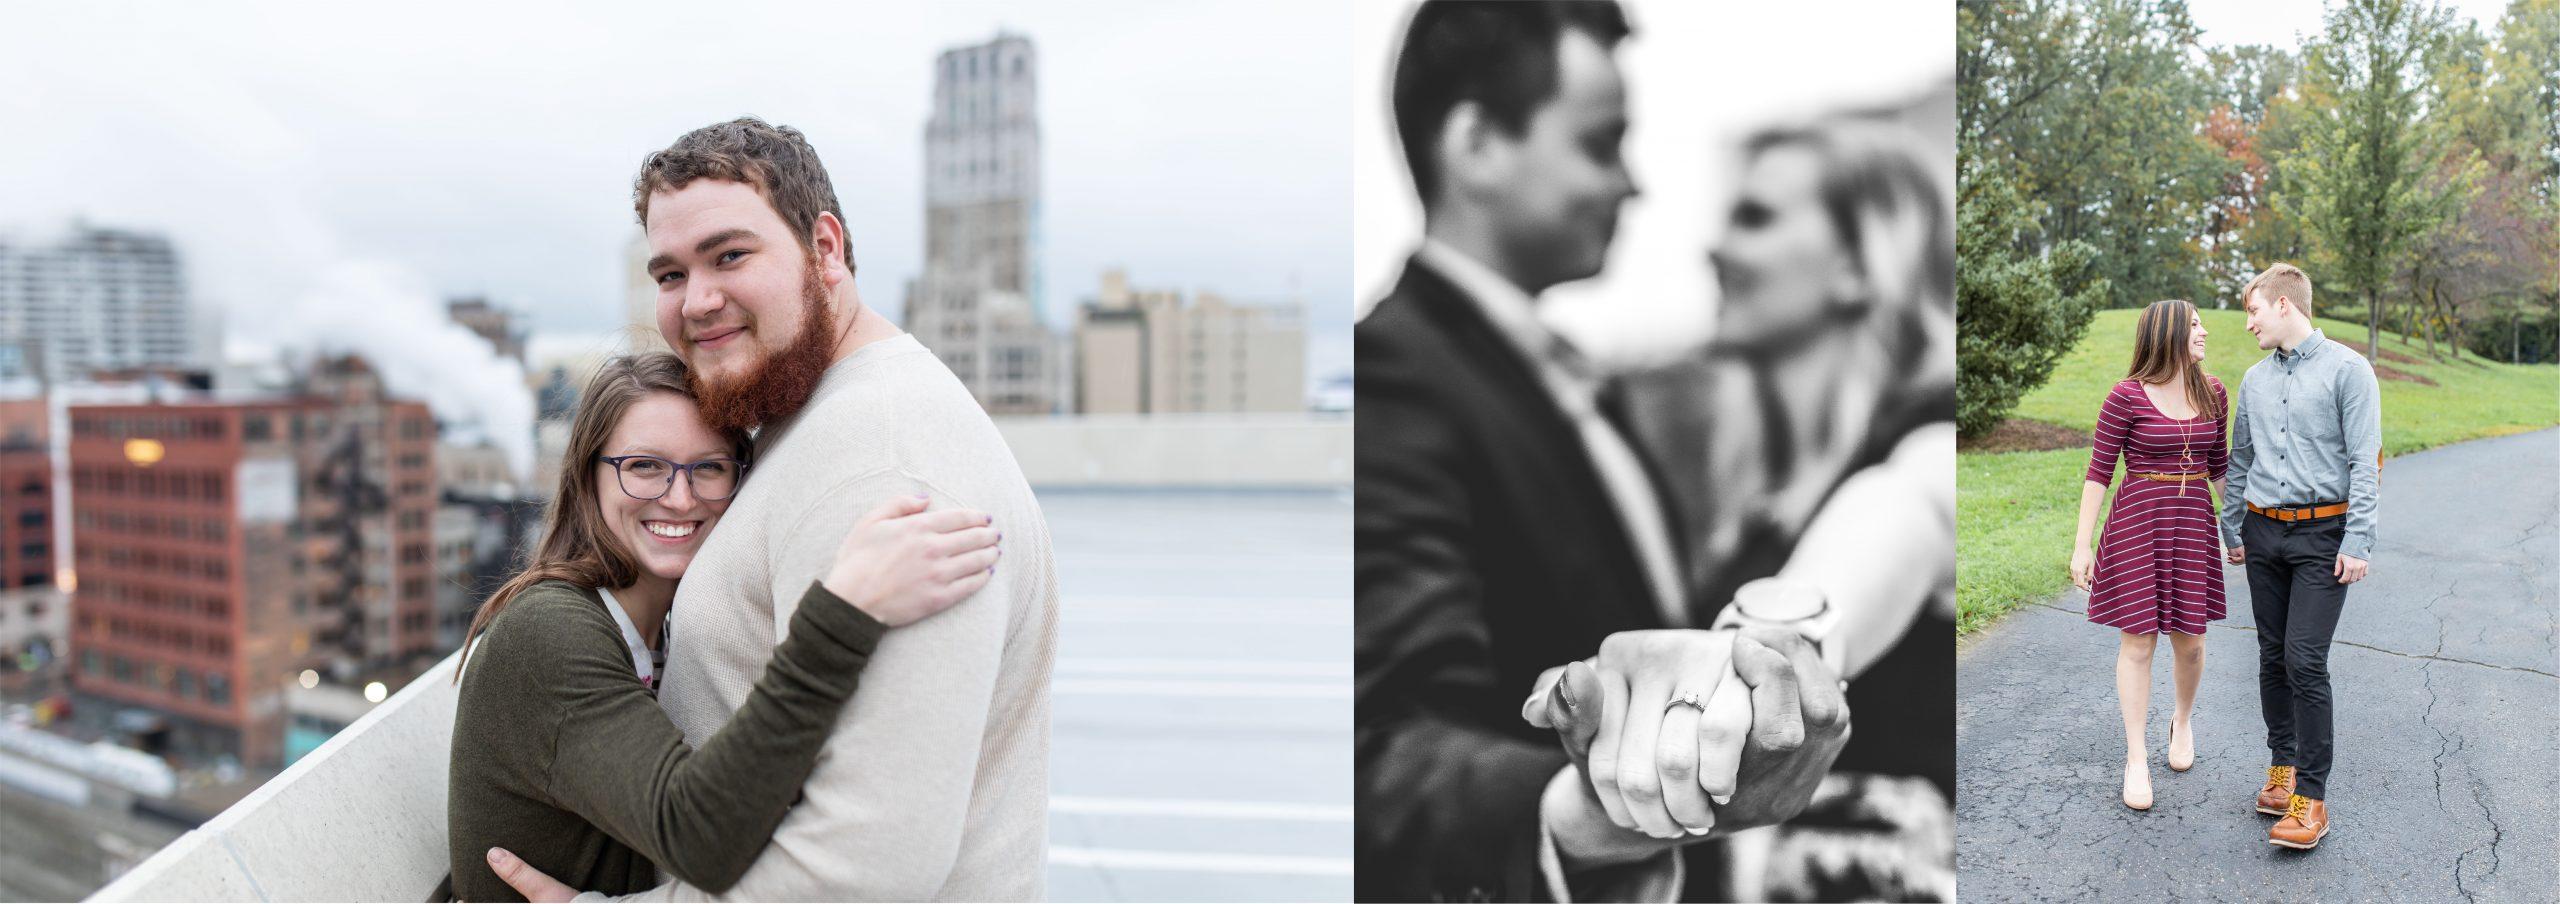 kandra-lynn-photography-wedding-photographer-02